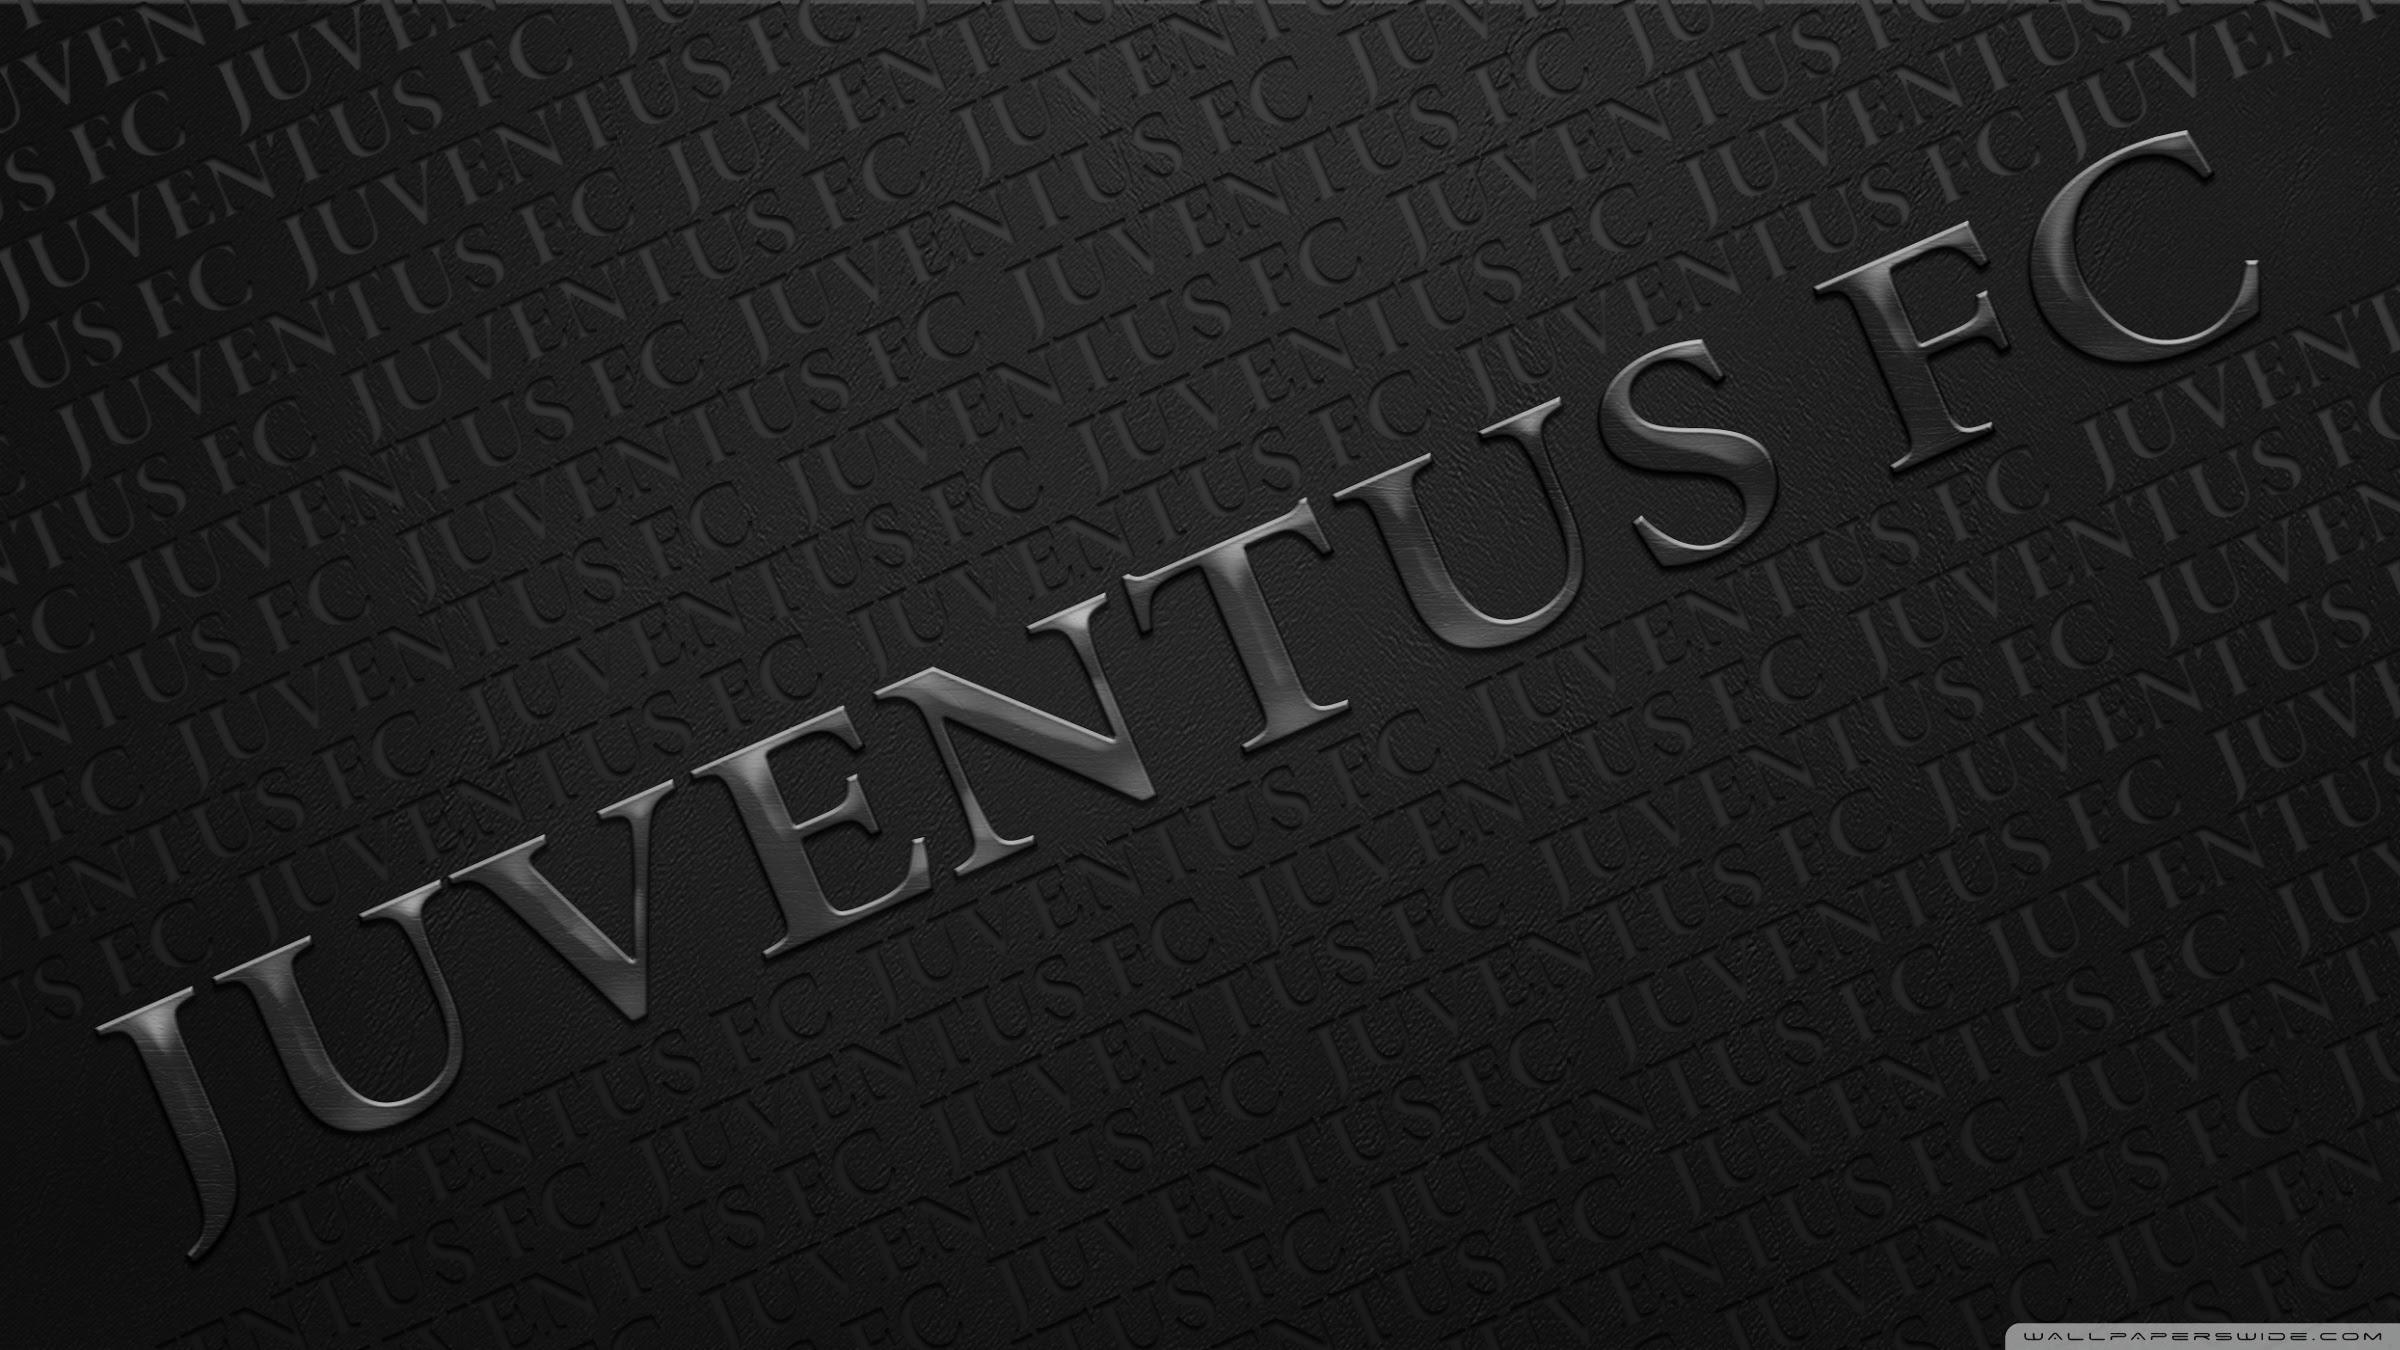 Wallpaper Juventus Stadium Hd Terbaru Gambar Dp Bbm